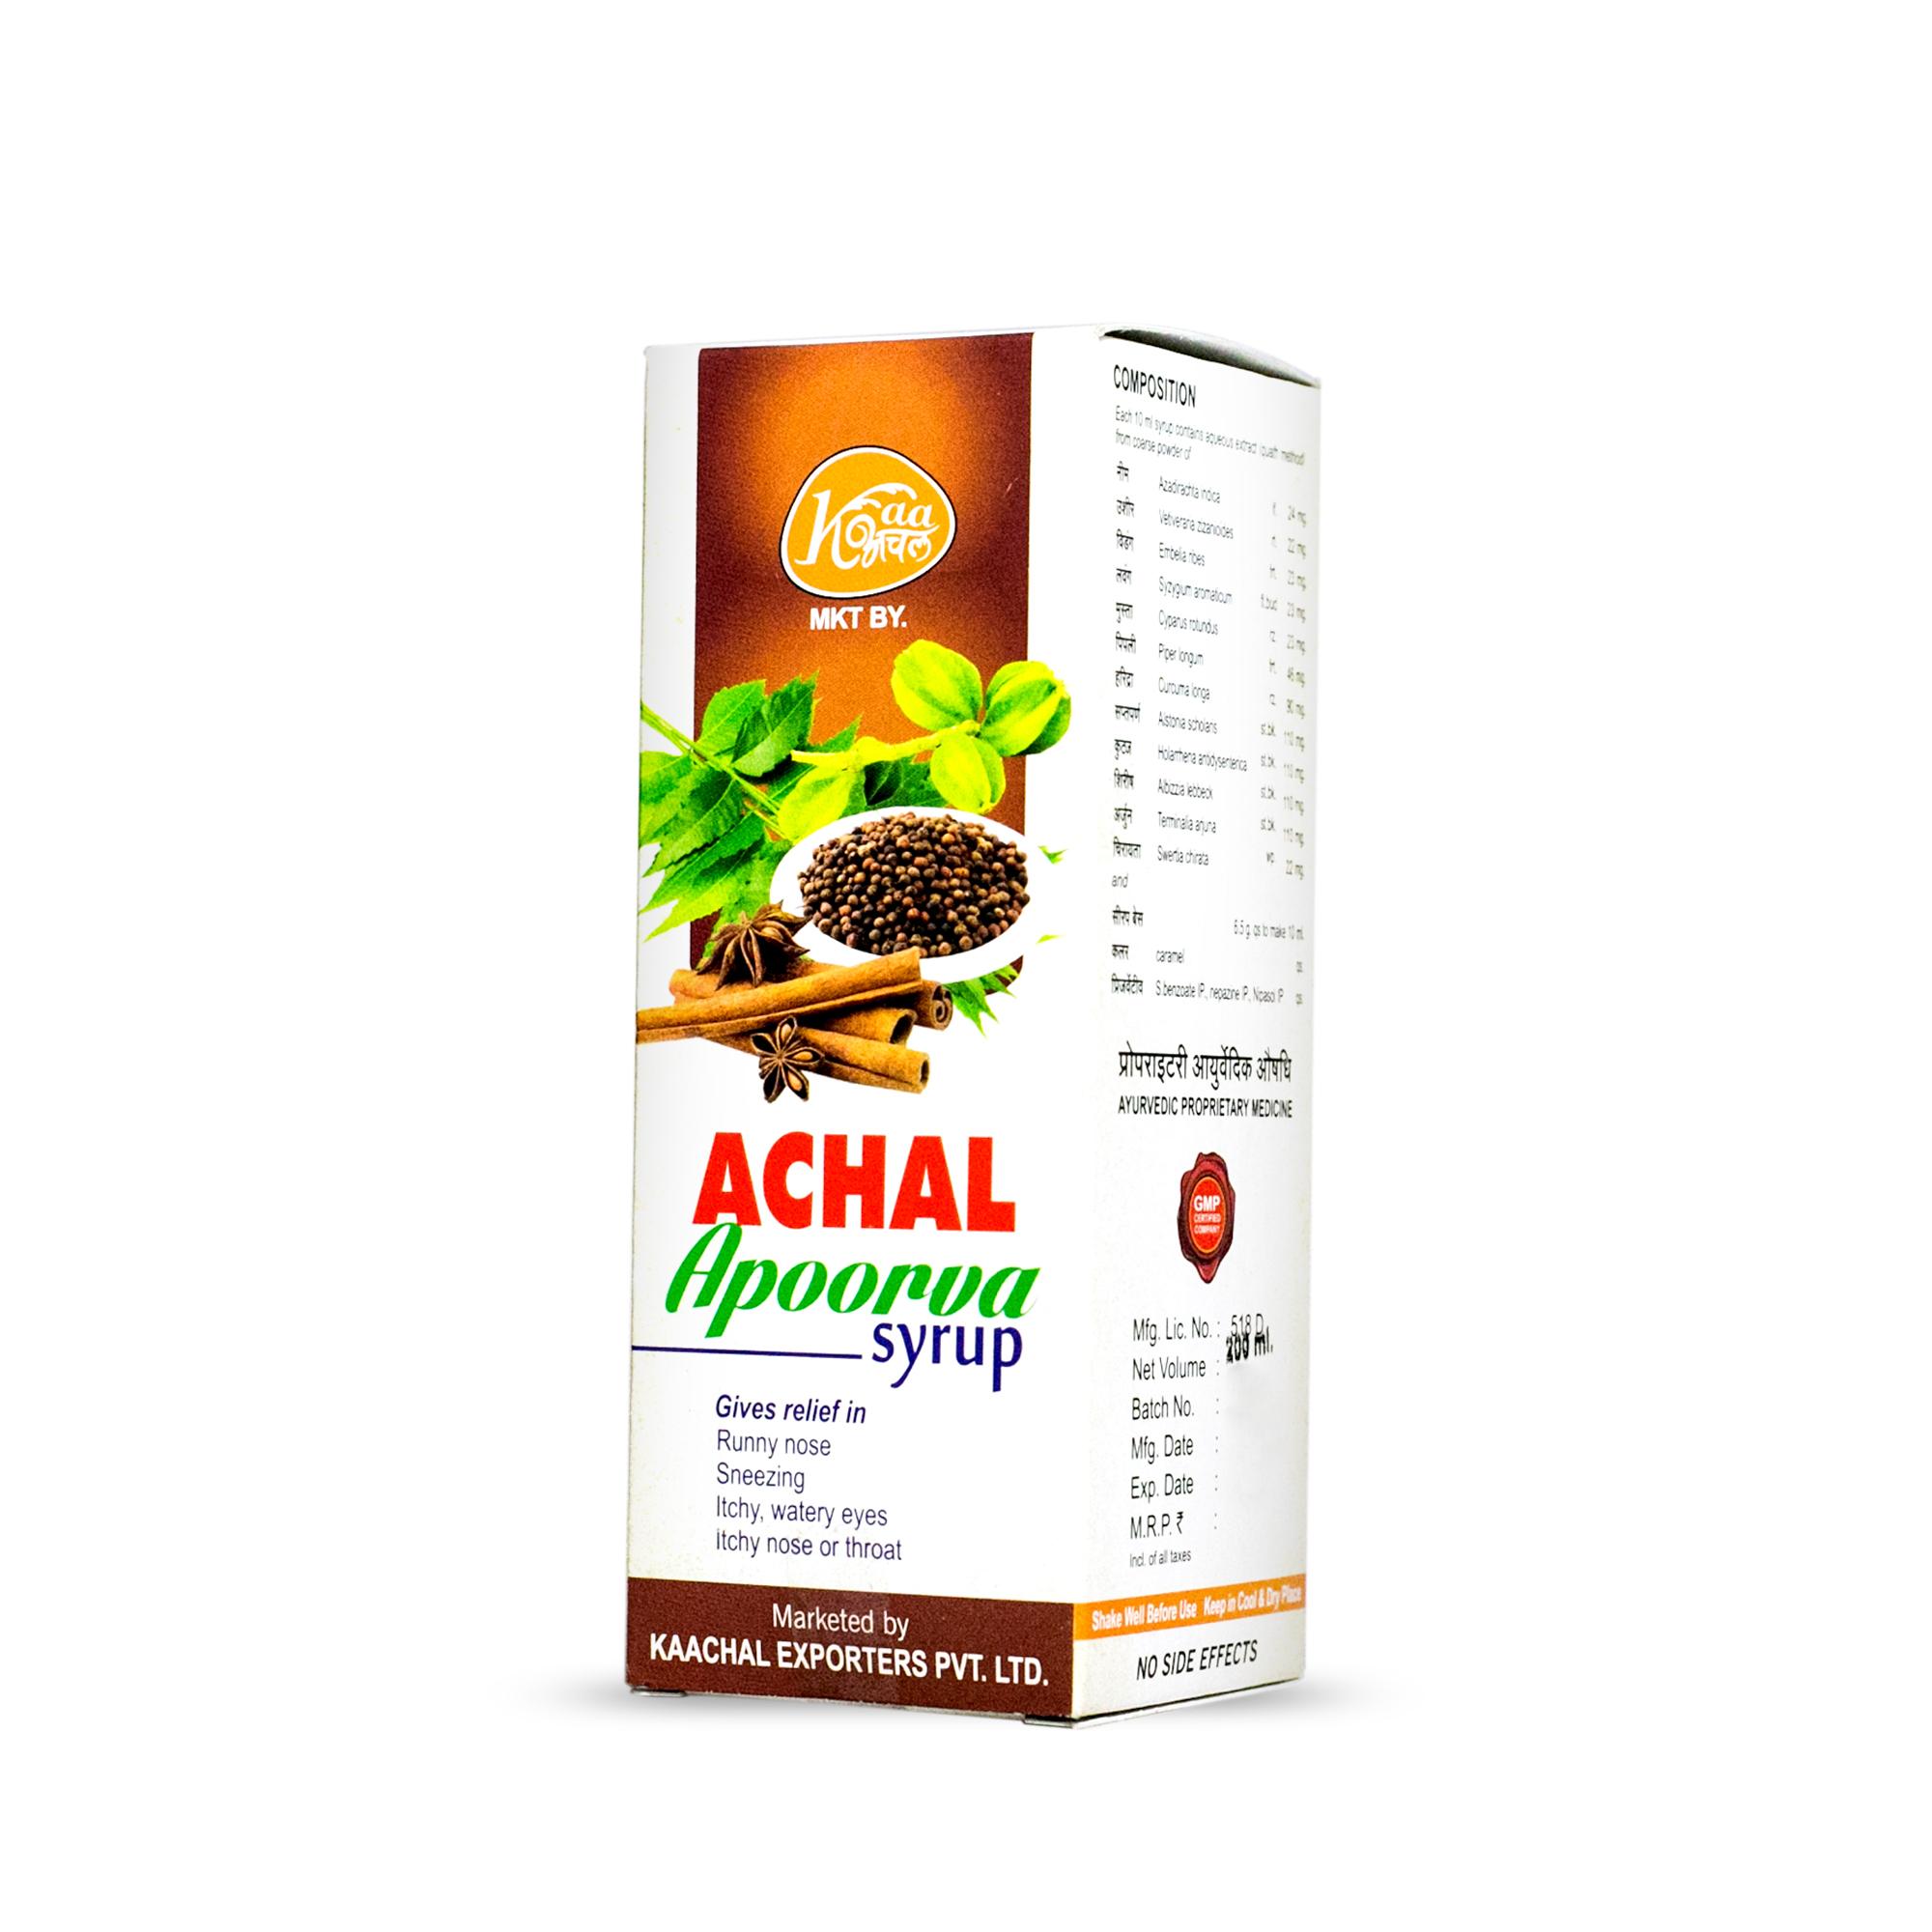 Achal Apoorva Syrup